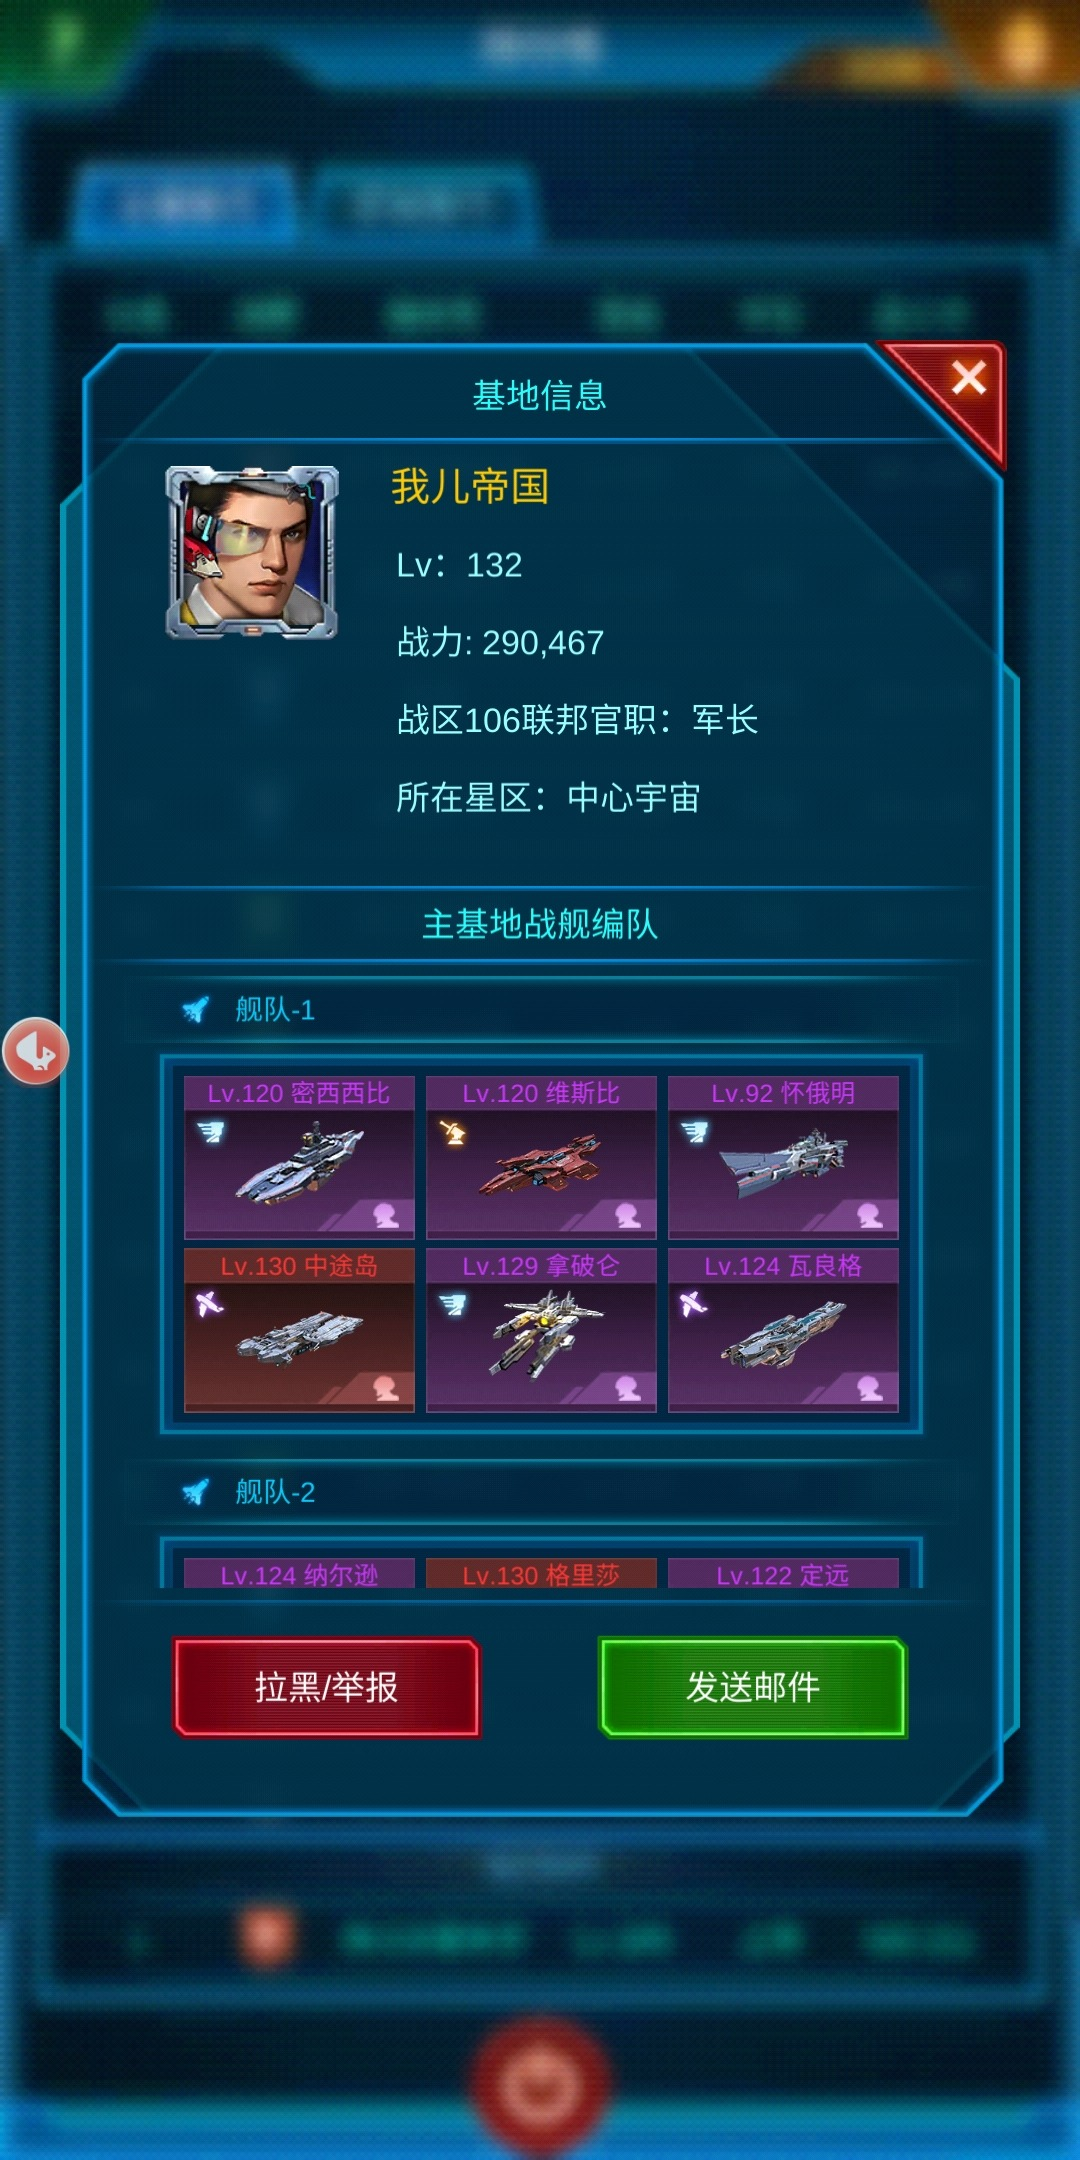 Screenshot_2020-02-11-11-27-02-930_com.ttnna.mobile.xjzjzk.jpg